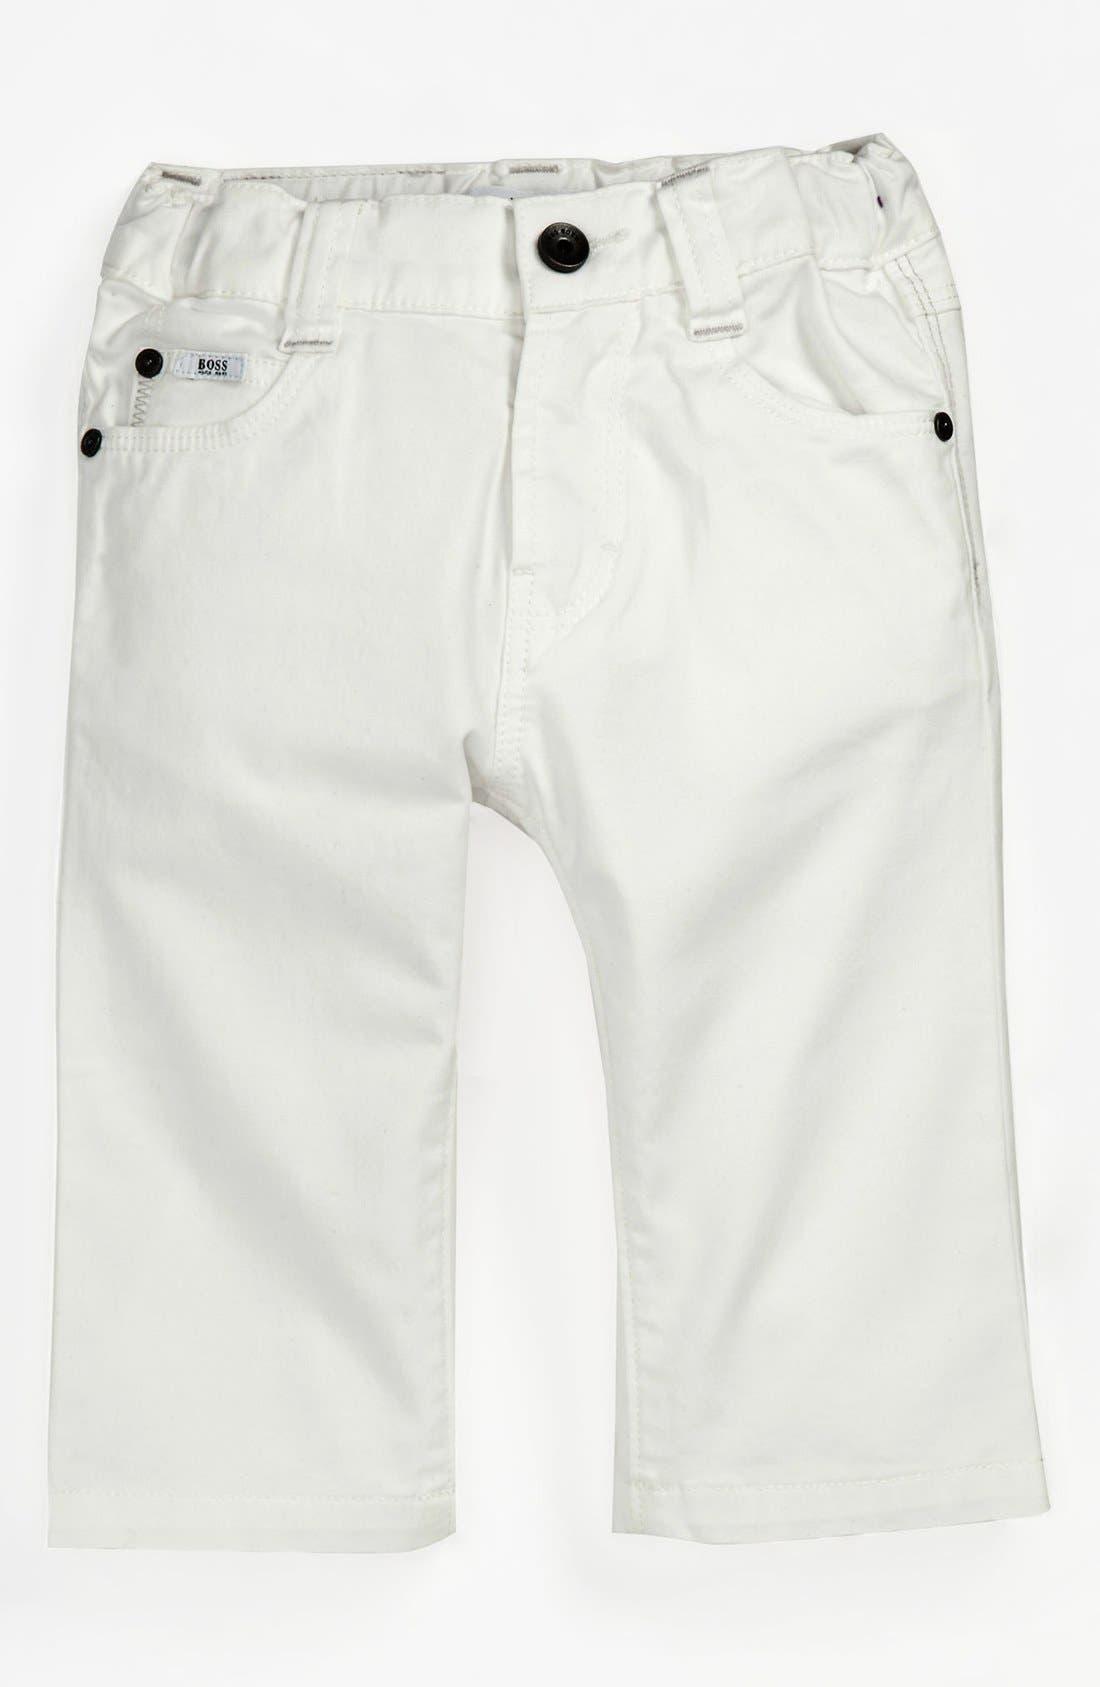 Alternate Image 1 Selected - BOSS Kidswear Twill Pants (Baby)